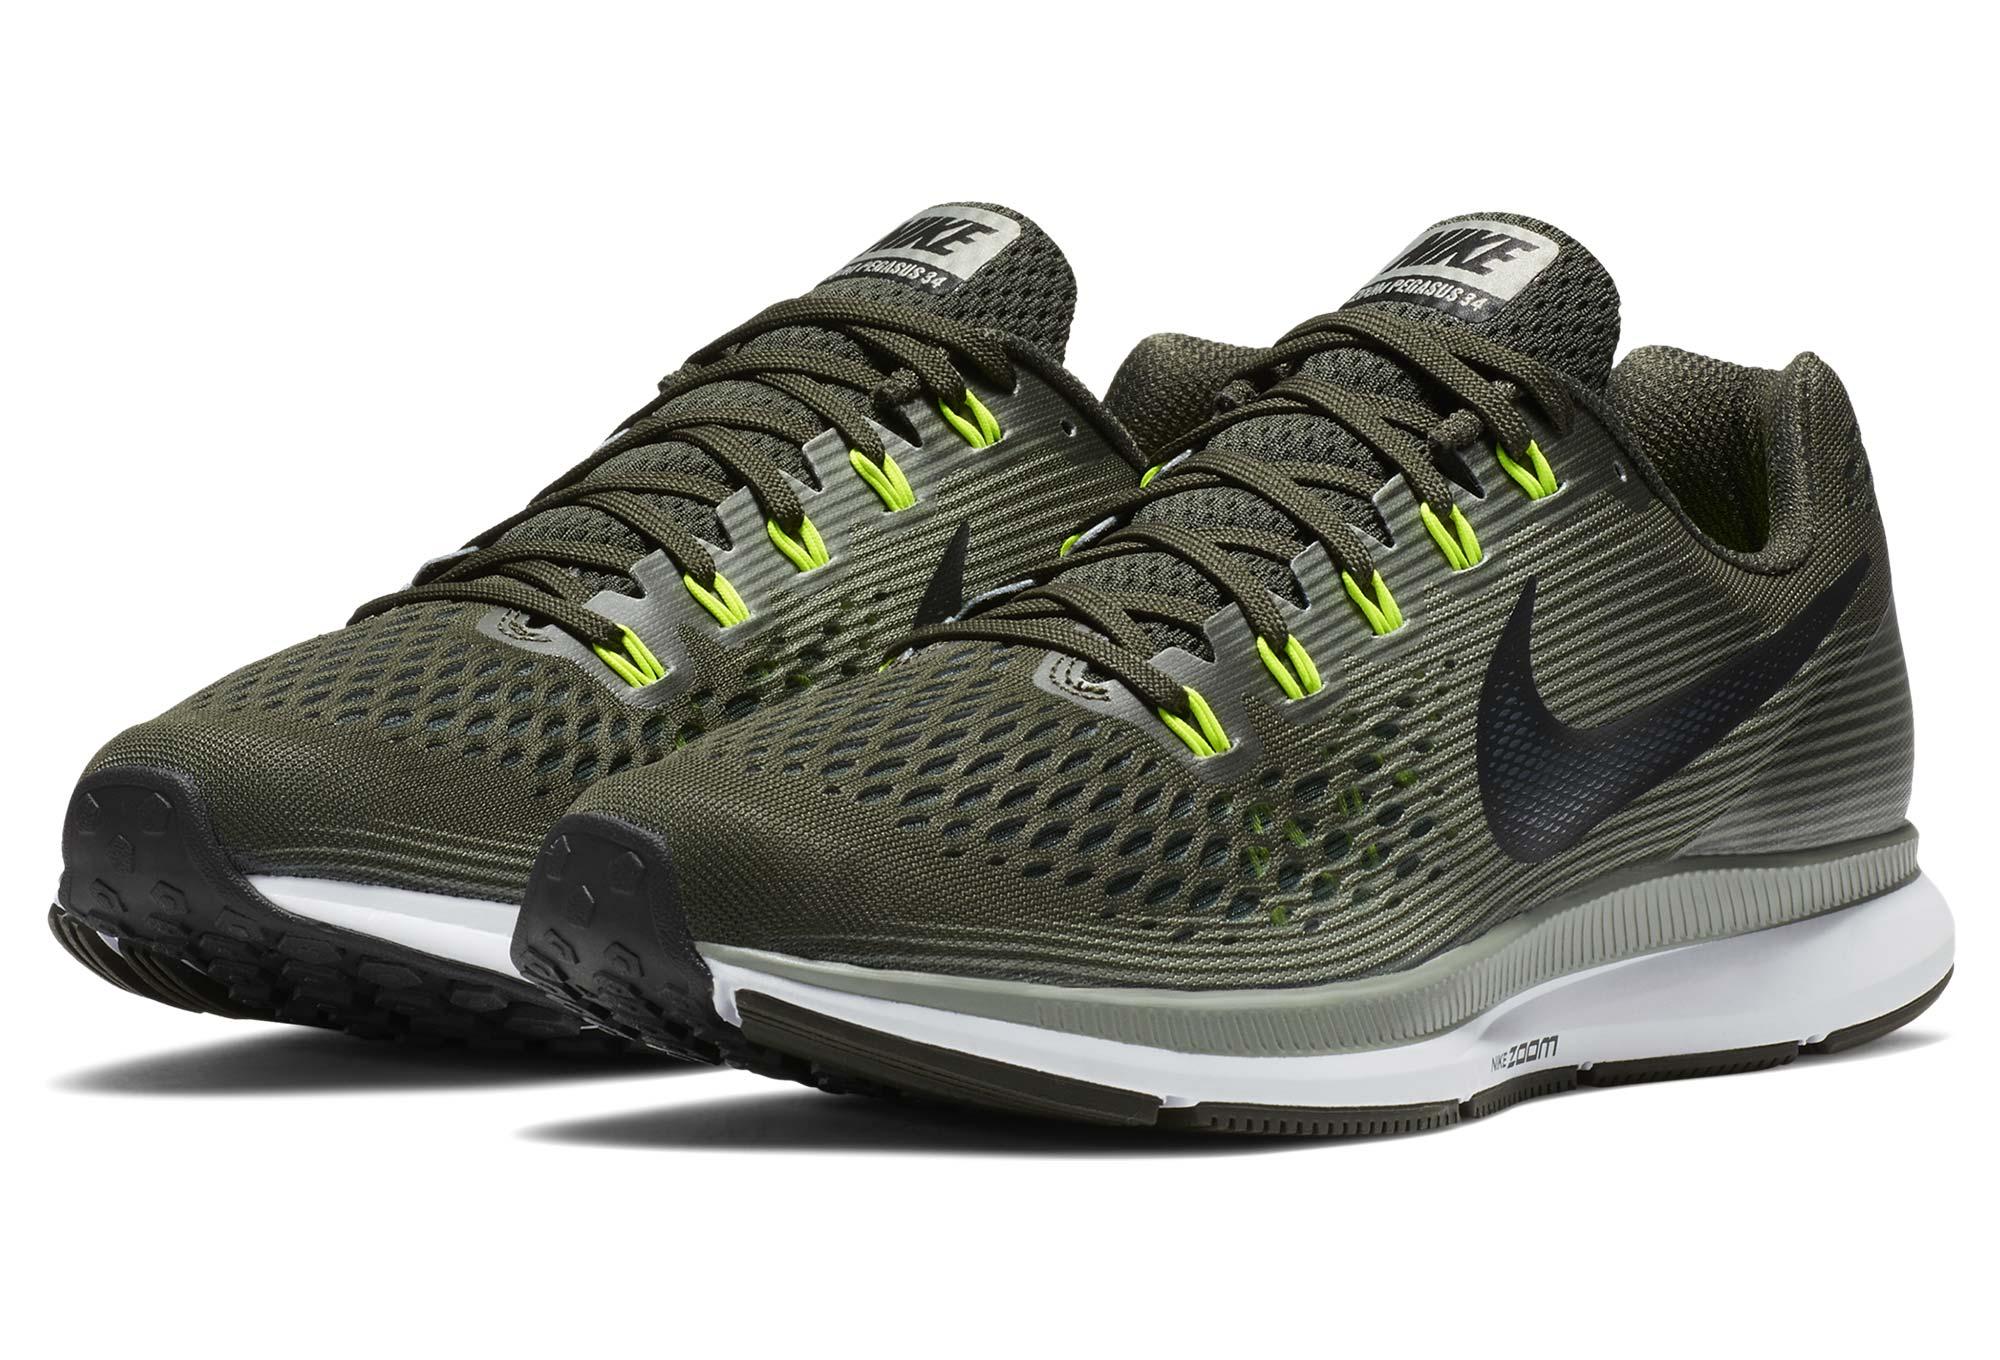 Chaussures Pegasus 34 Homme Running Vert Kaki Air De Zoom Nike RL5jA4